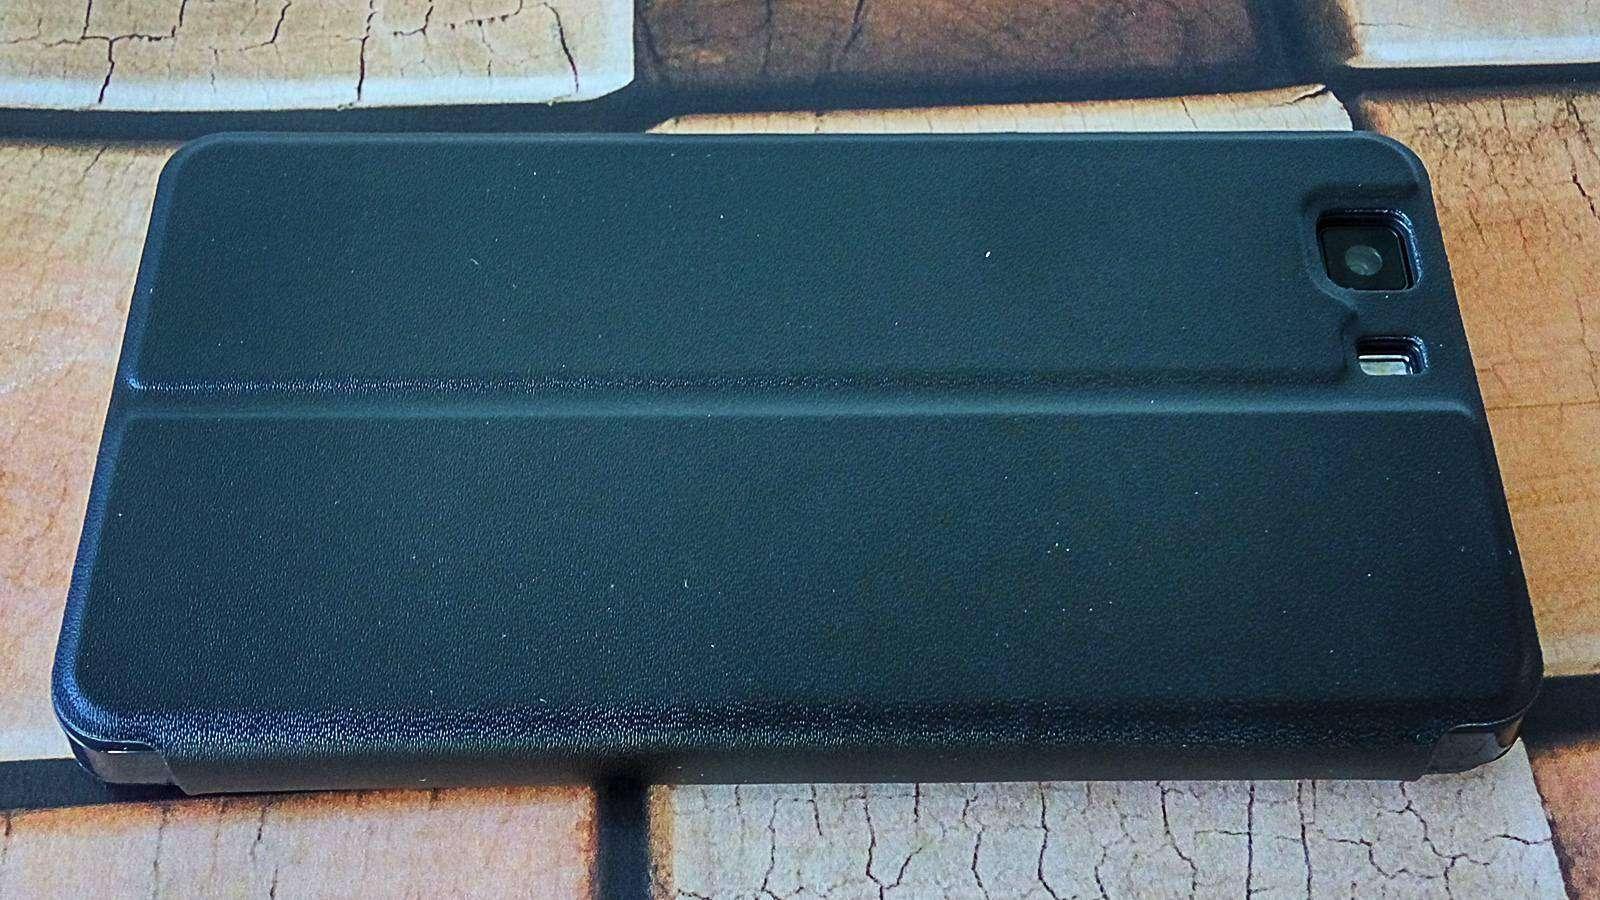 GearBest: Обзор DOOGEE X5 Pro, отличный бюджетник